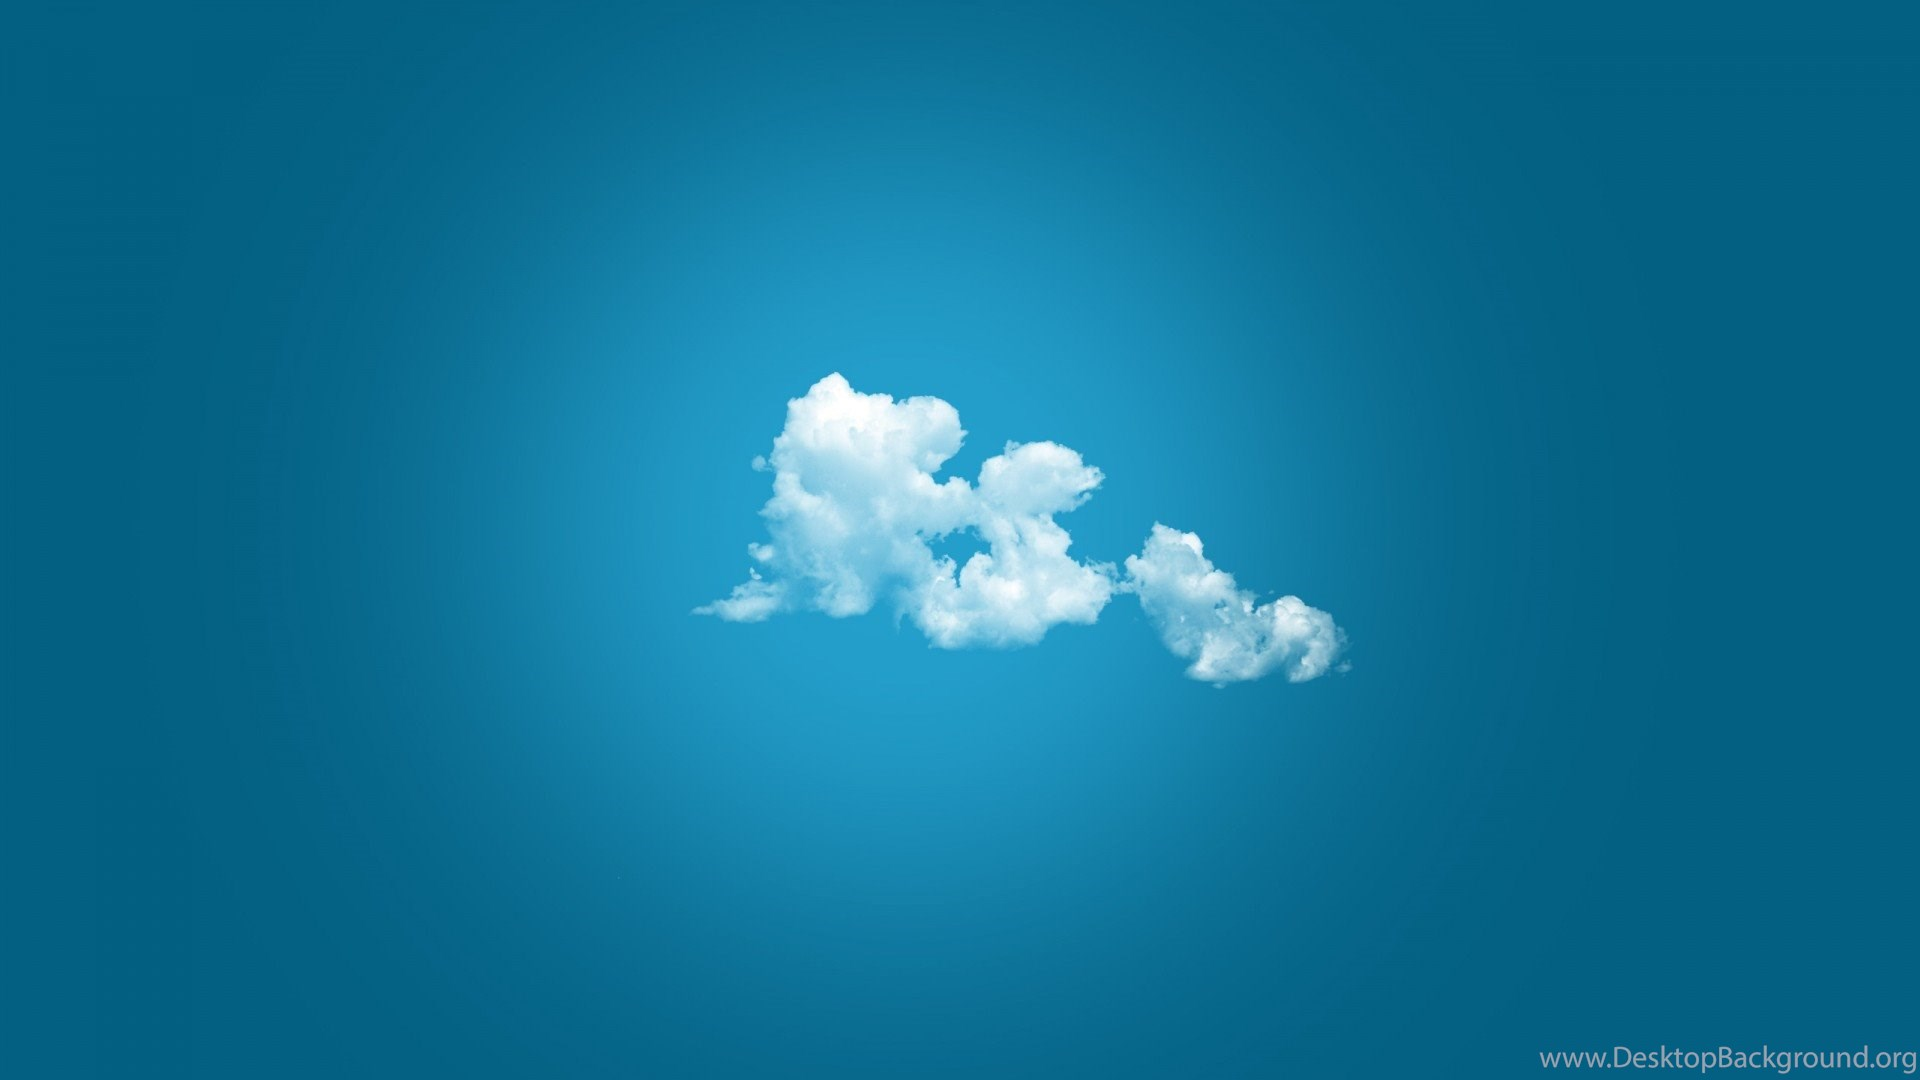 Wallpapers Simple Hd Nature Cloud Sky 1920x1080 Desktop Background